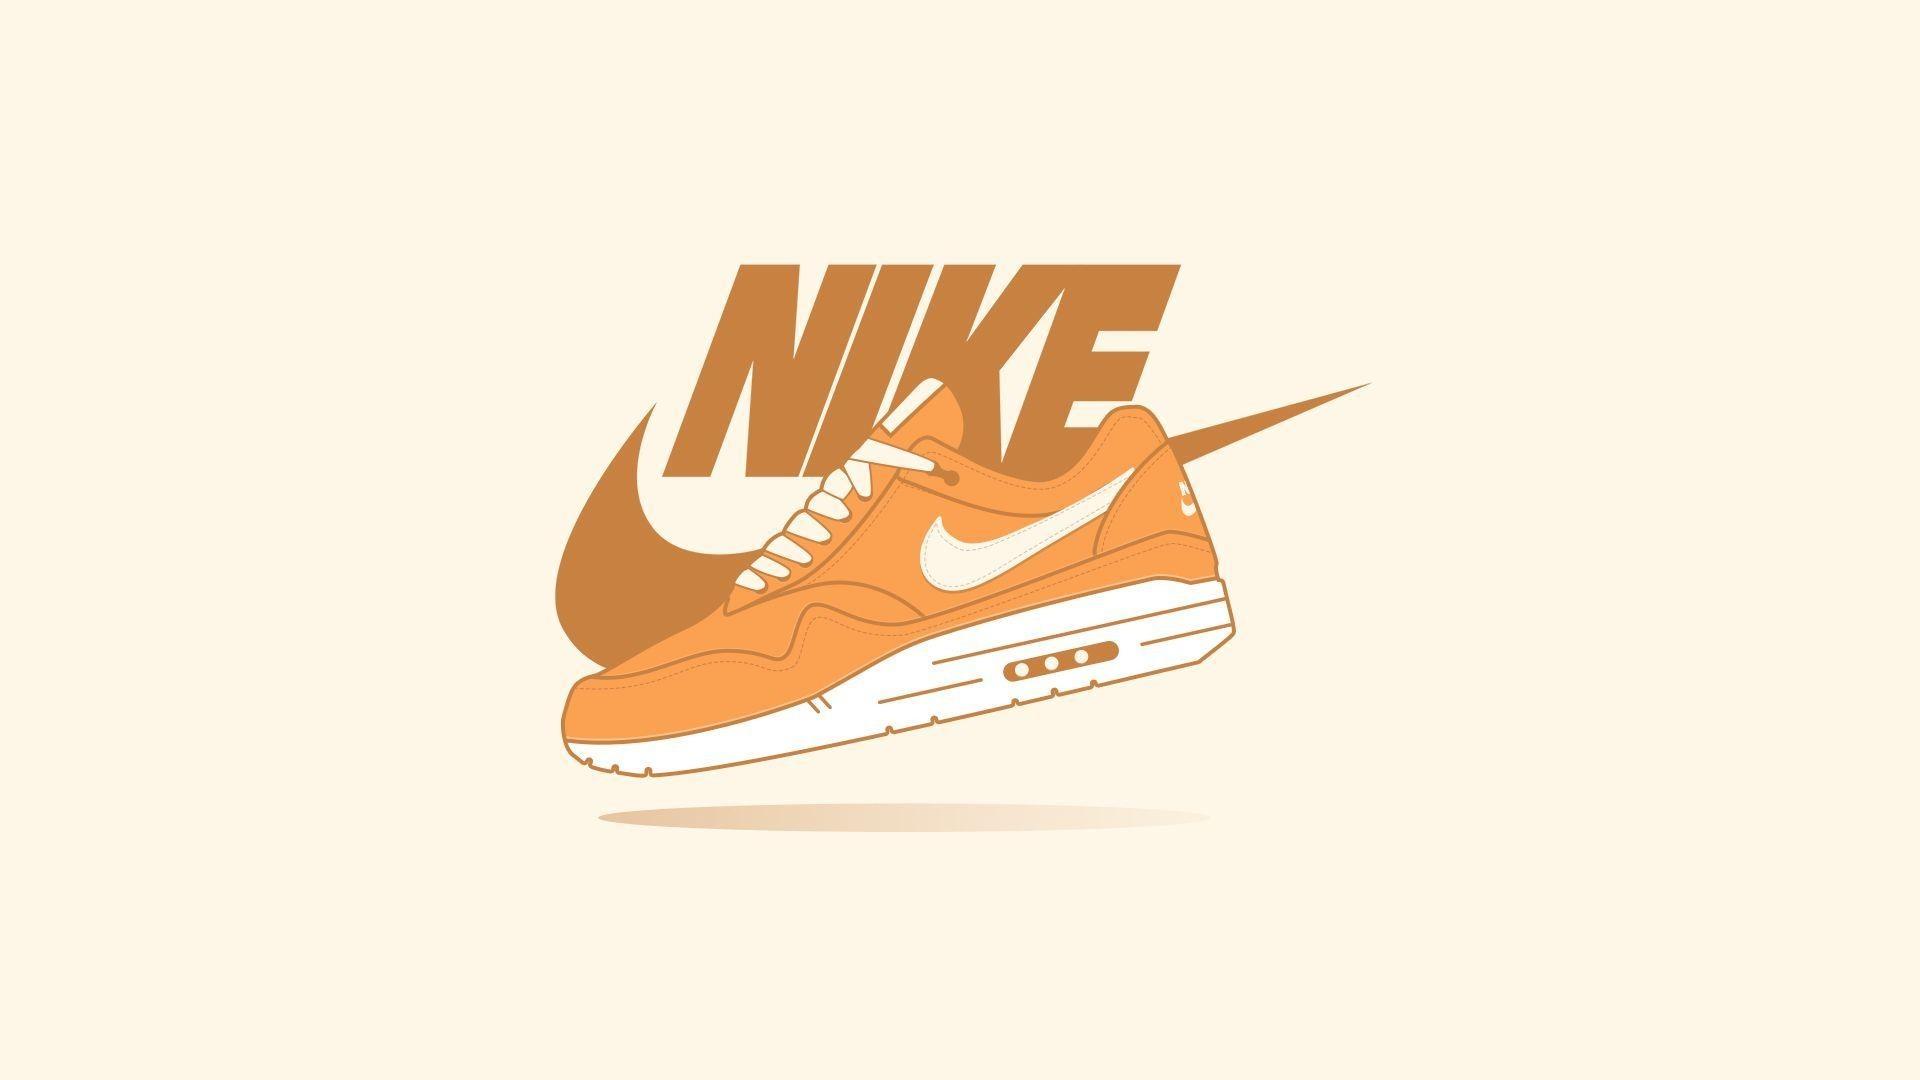 Res: 1920x1080, Nike Air Max Wallpaper